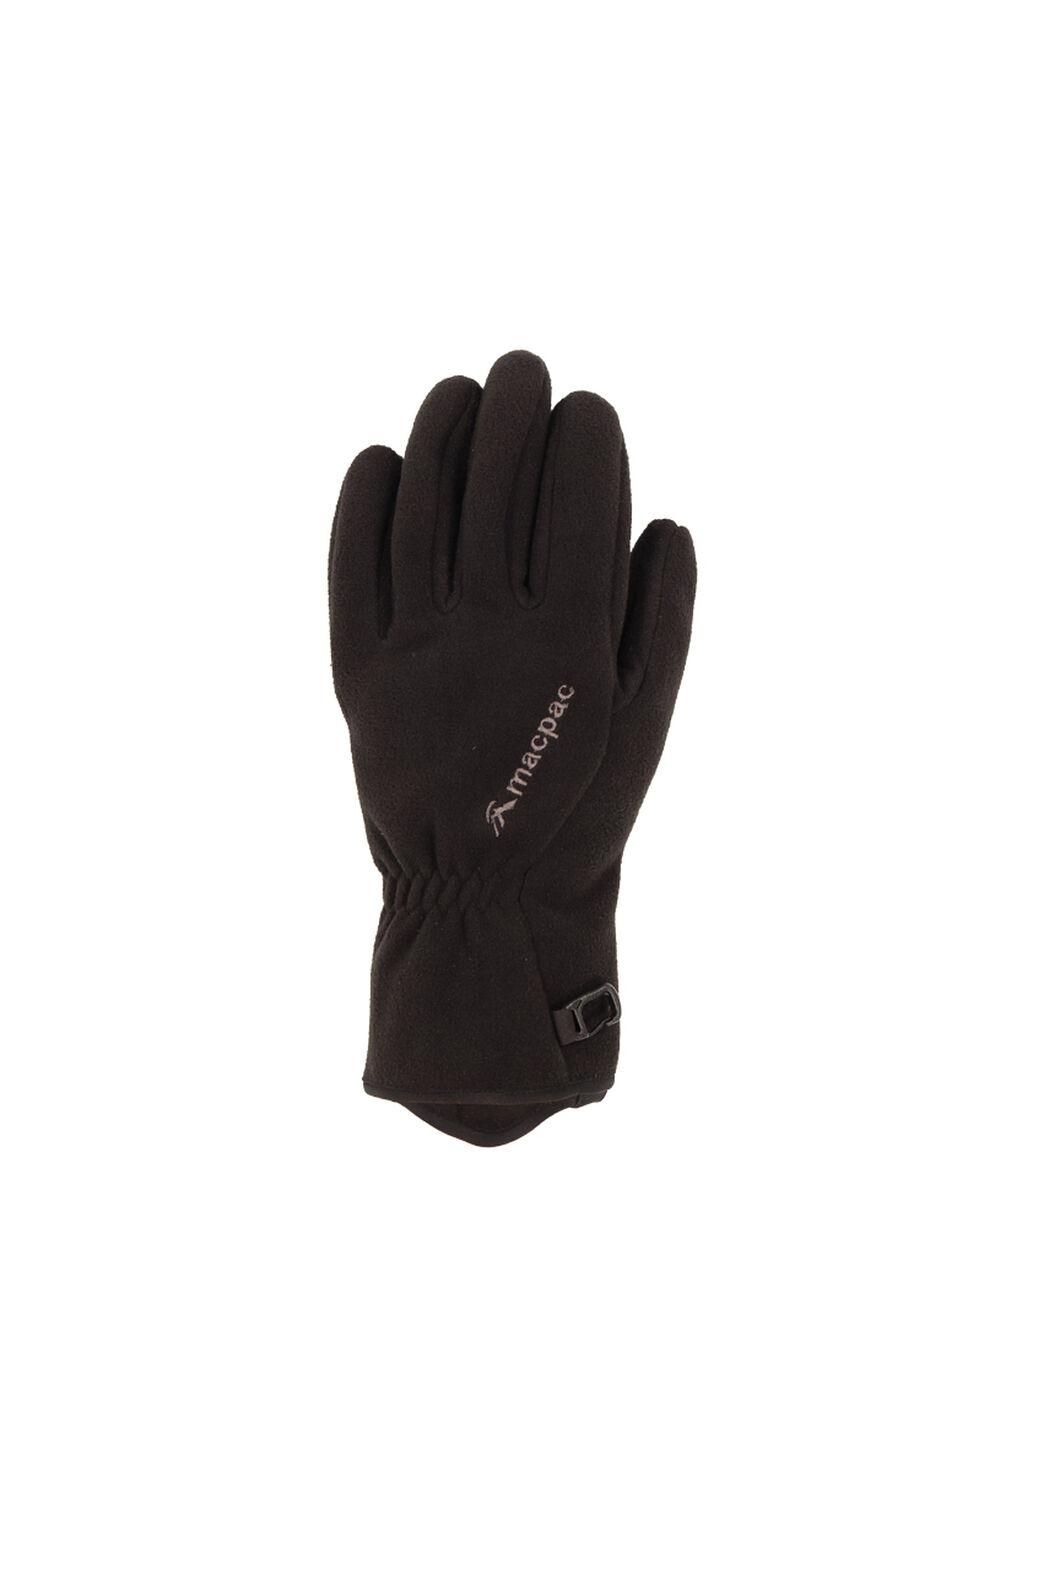 Macpac Flurry Gloves, Black, hi-res